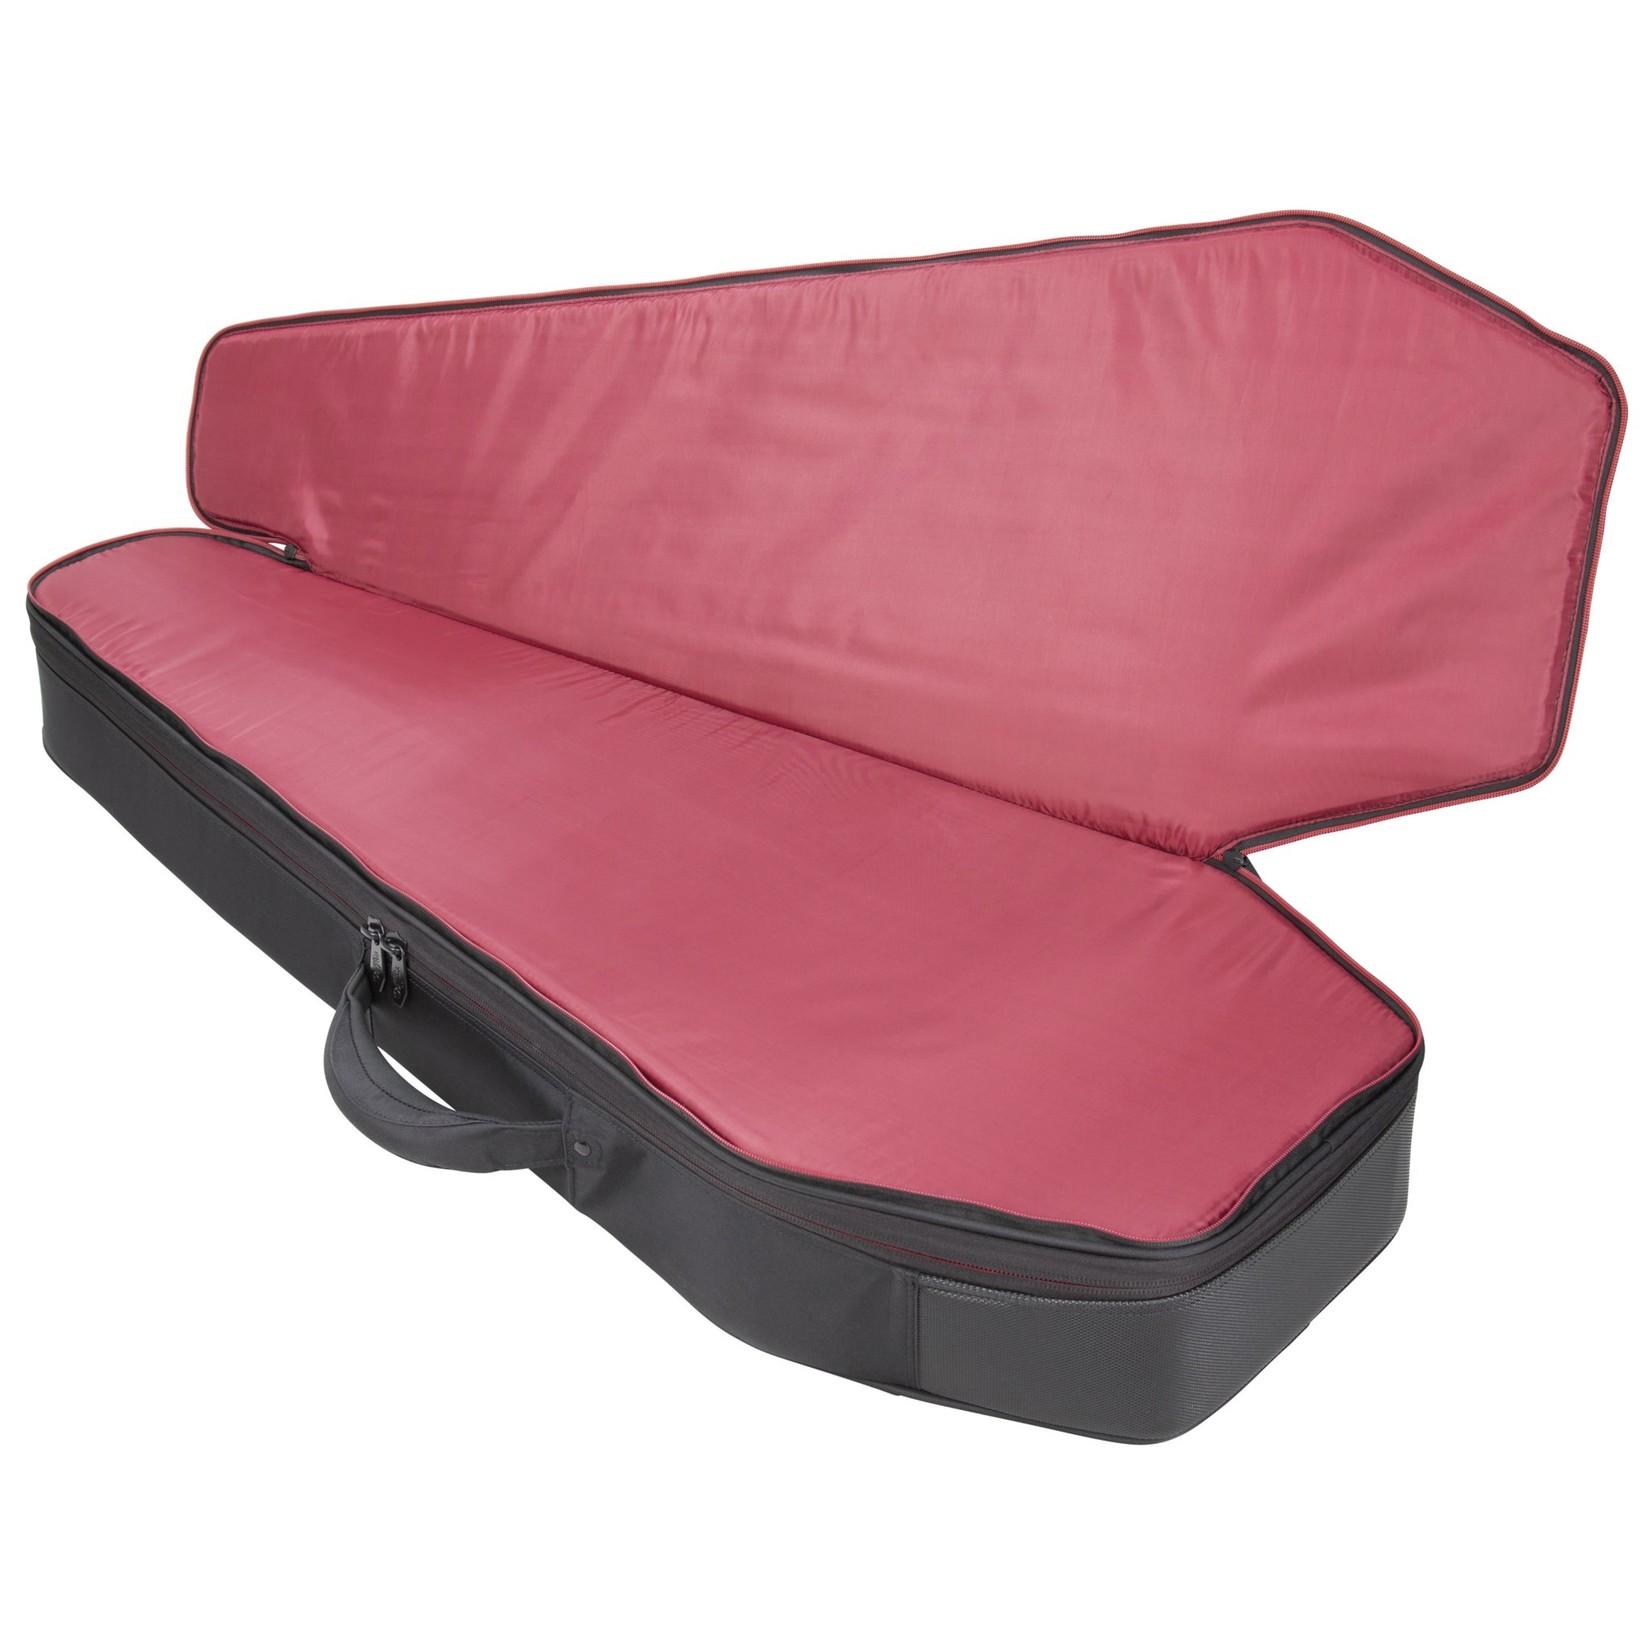 Coffin Case Coffin Chimera Series Electric Guitar Hybrid Case (Rigid Plush Gig Bag), Black